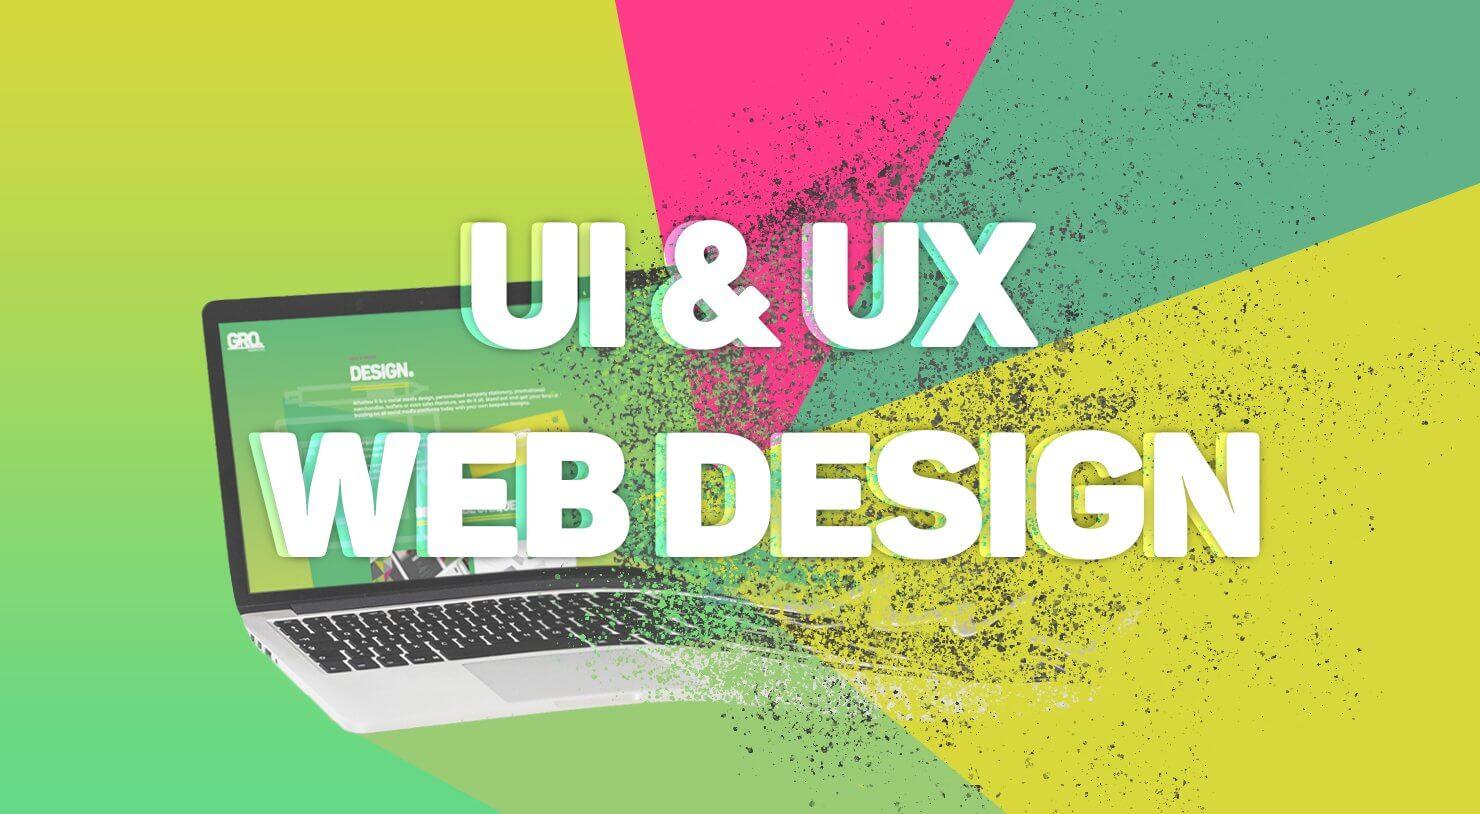 websites hull, web design hull, website company hull